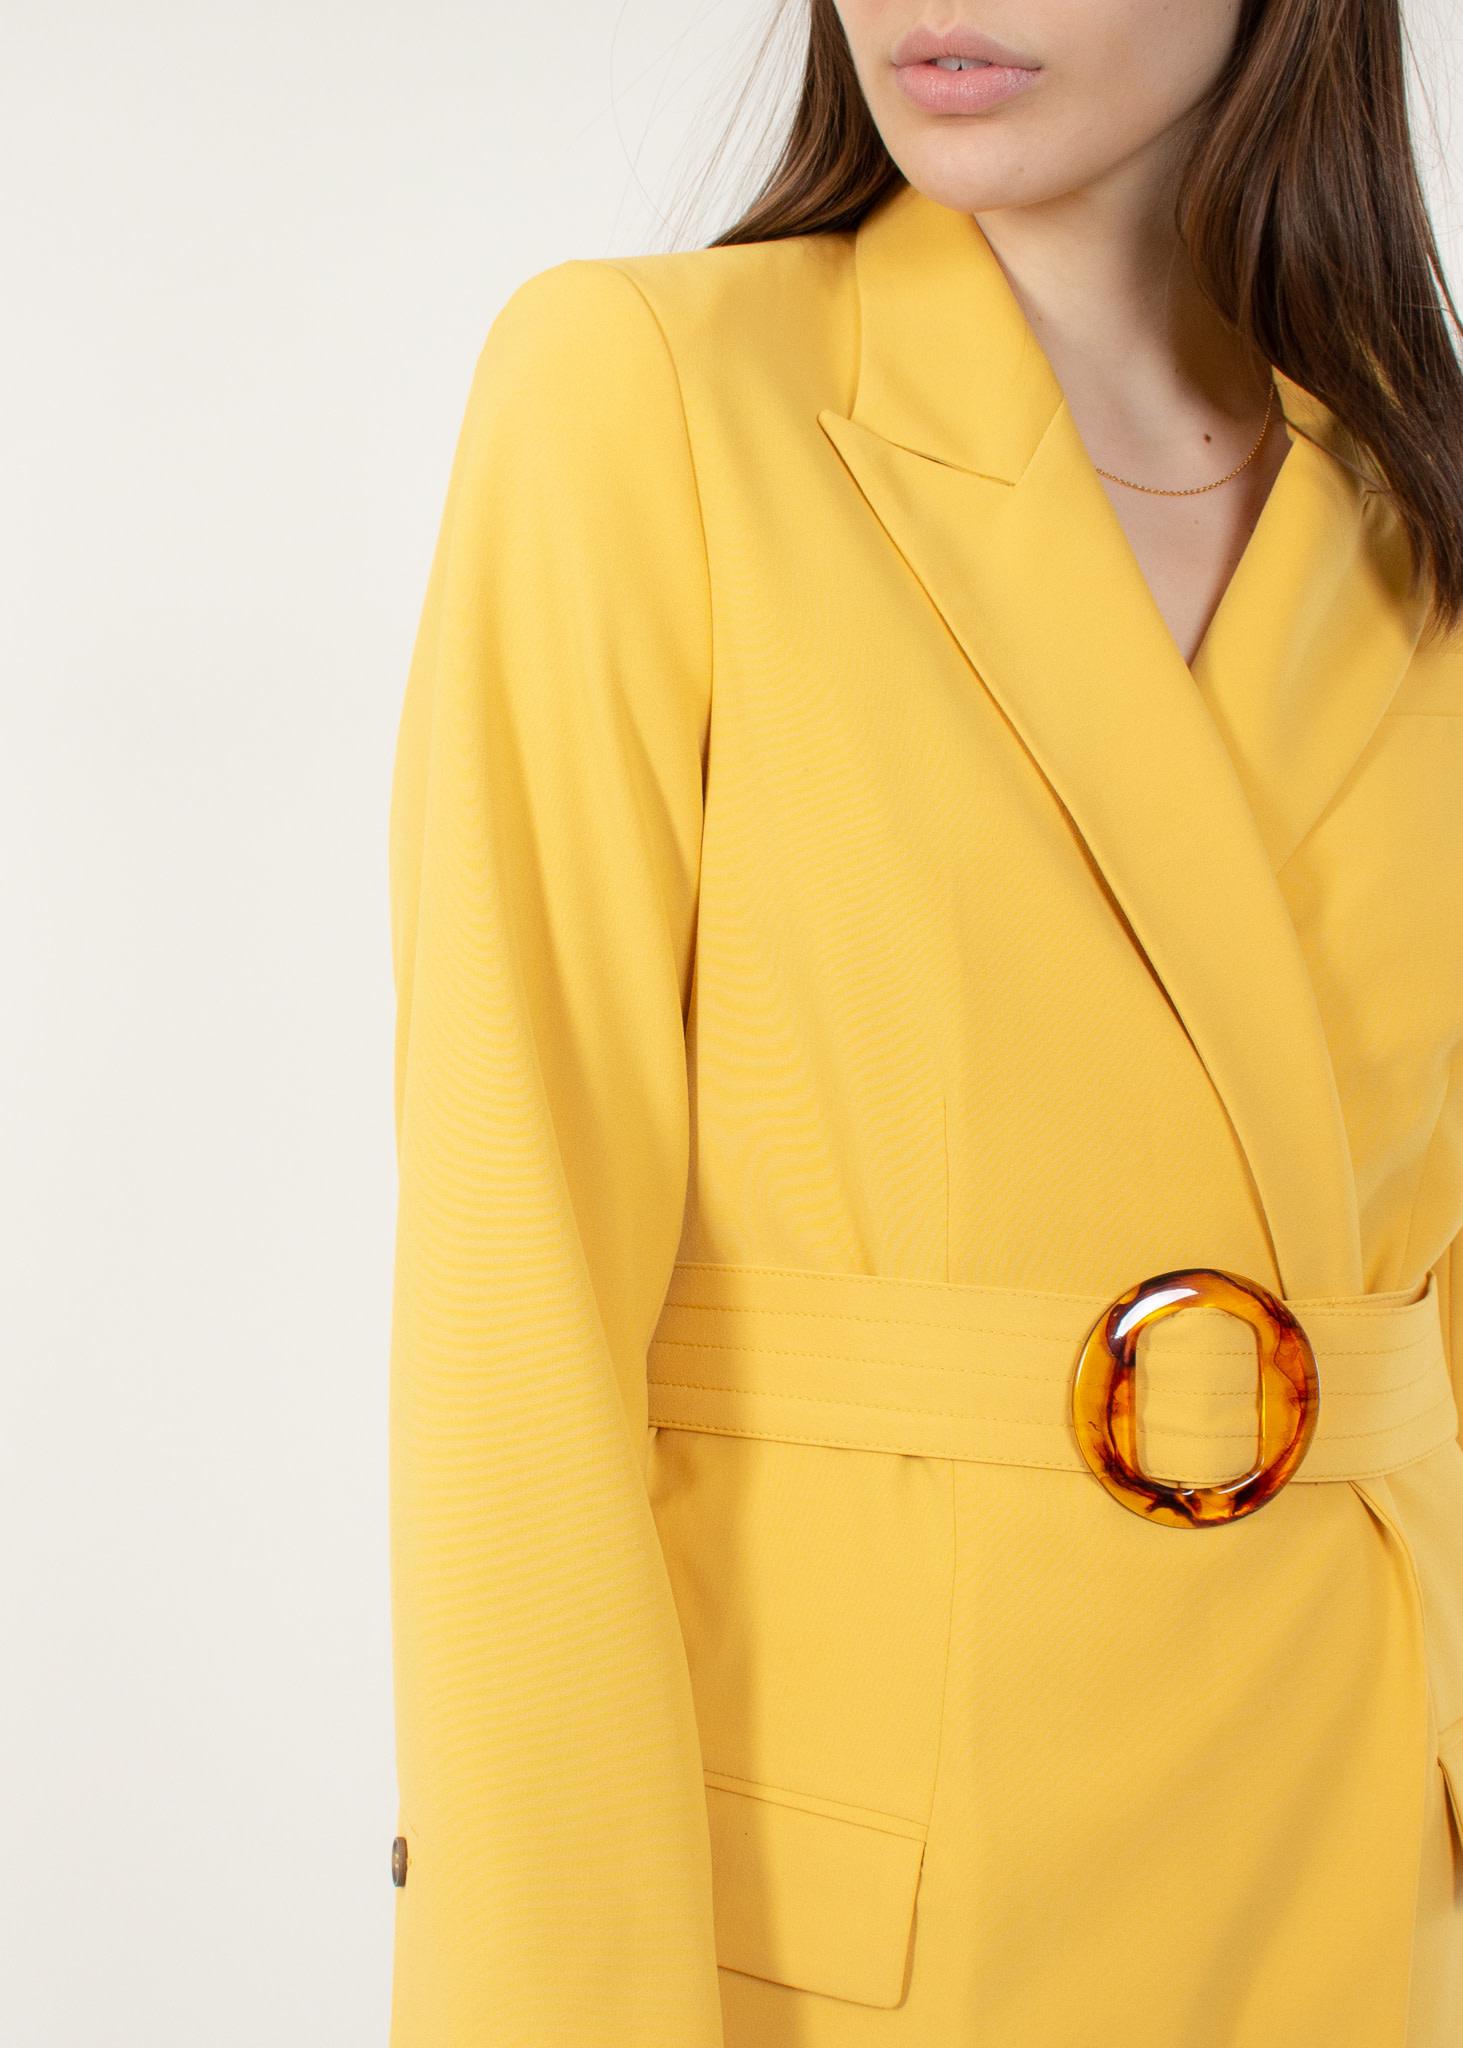 KAREN BY SIMONSEN Melbourne blazer